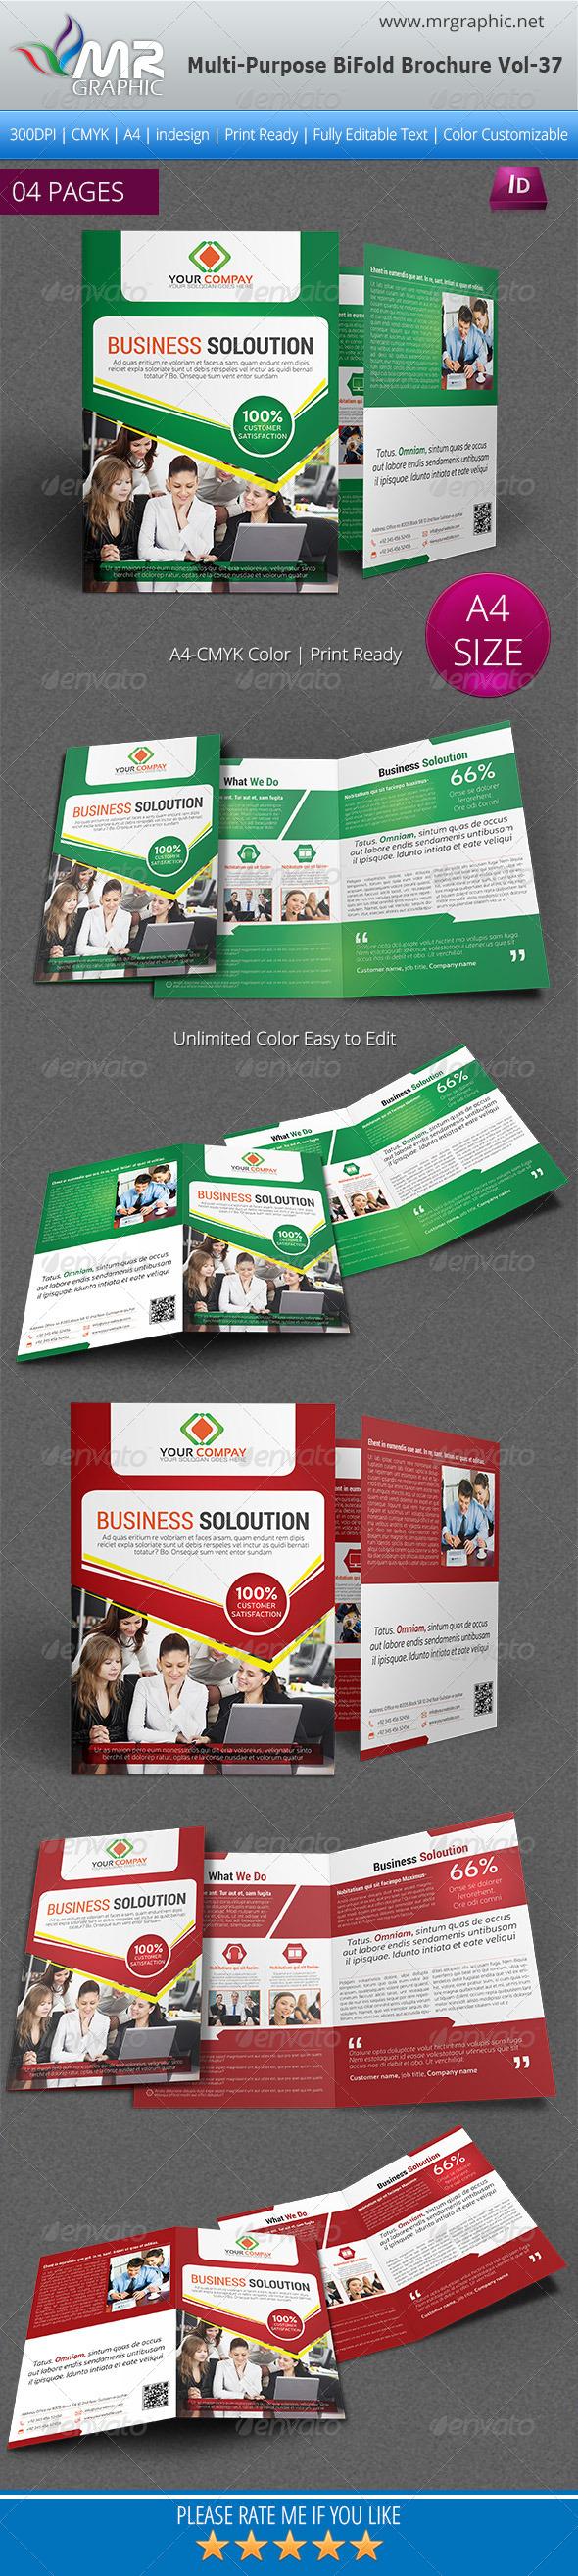 Multipurpose Bifold Brochure Template Vol-37 - Corporate Brochures